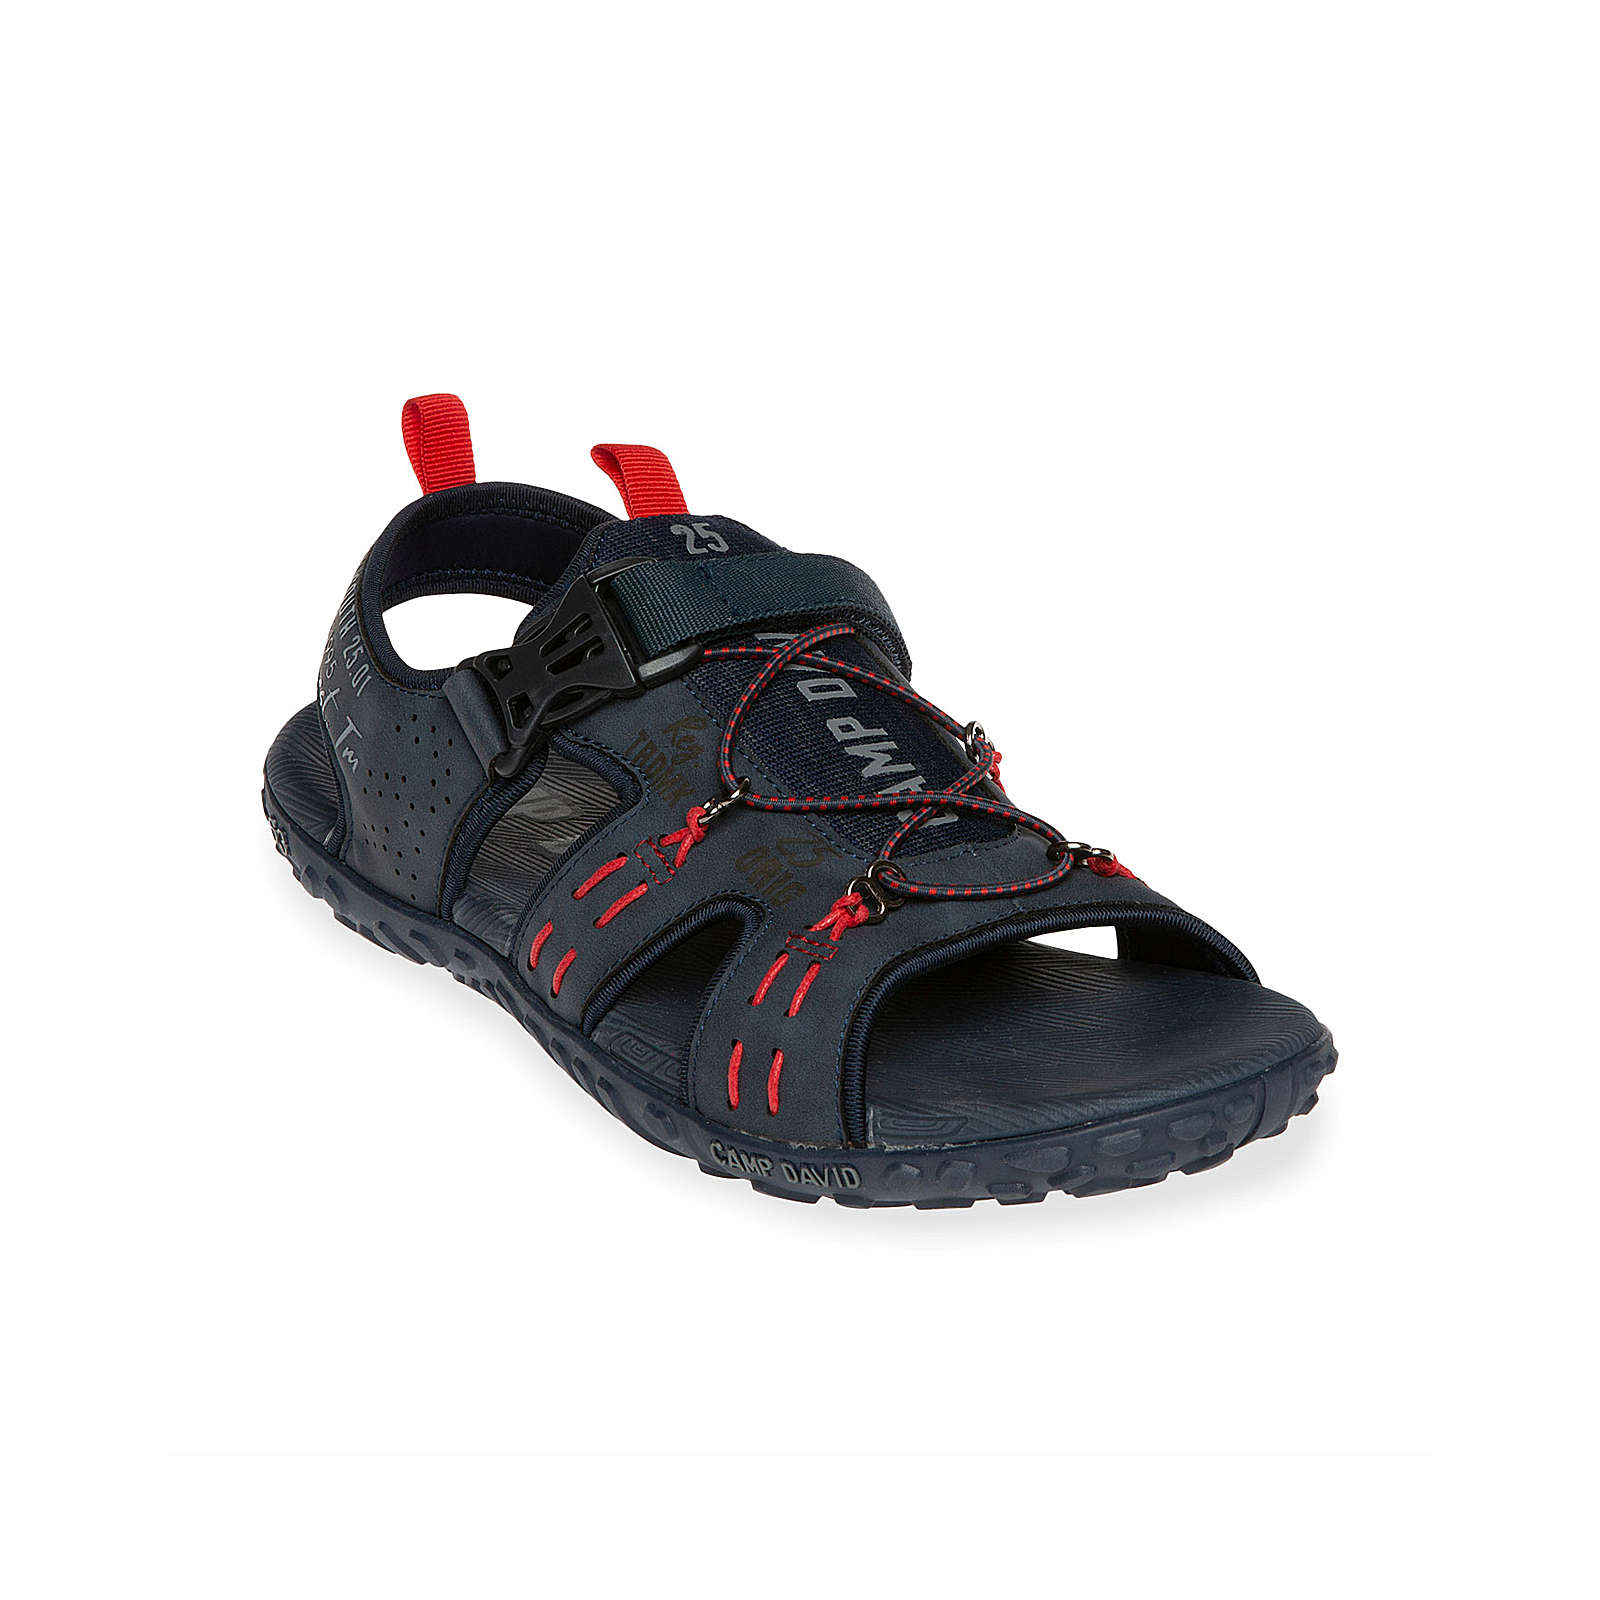 Camp David Trekking-Sandale mit Logo dunkelblau Herren Gr. 44